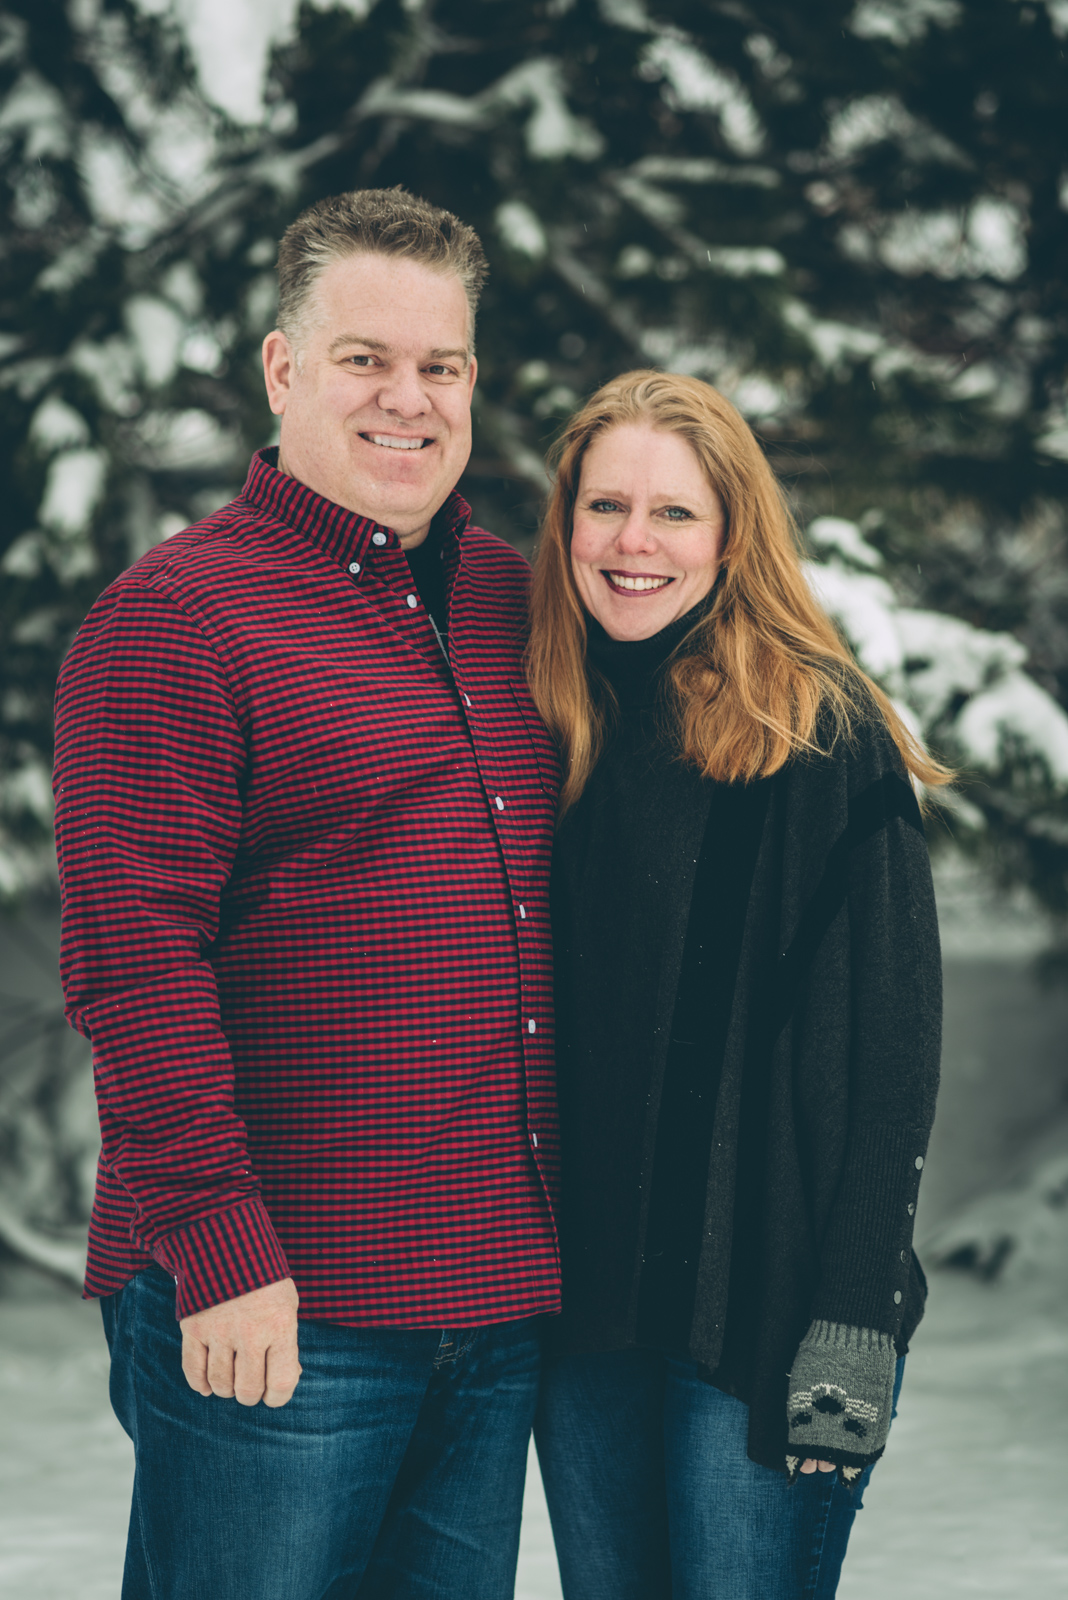 ashlyn-family-portraits-blog-9.jpg